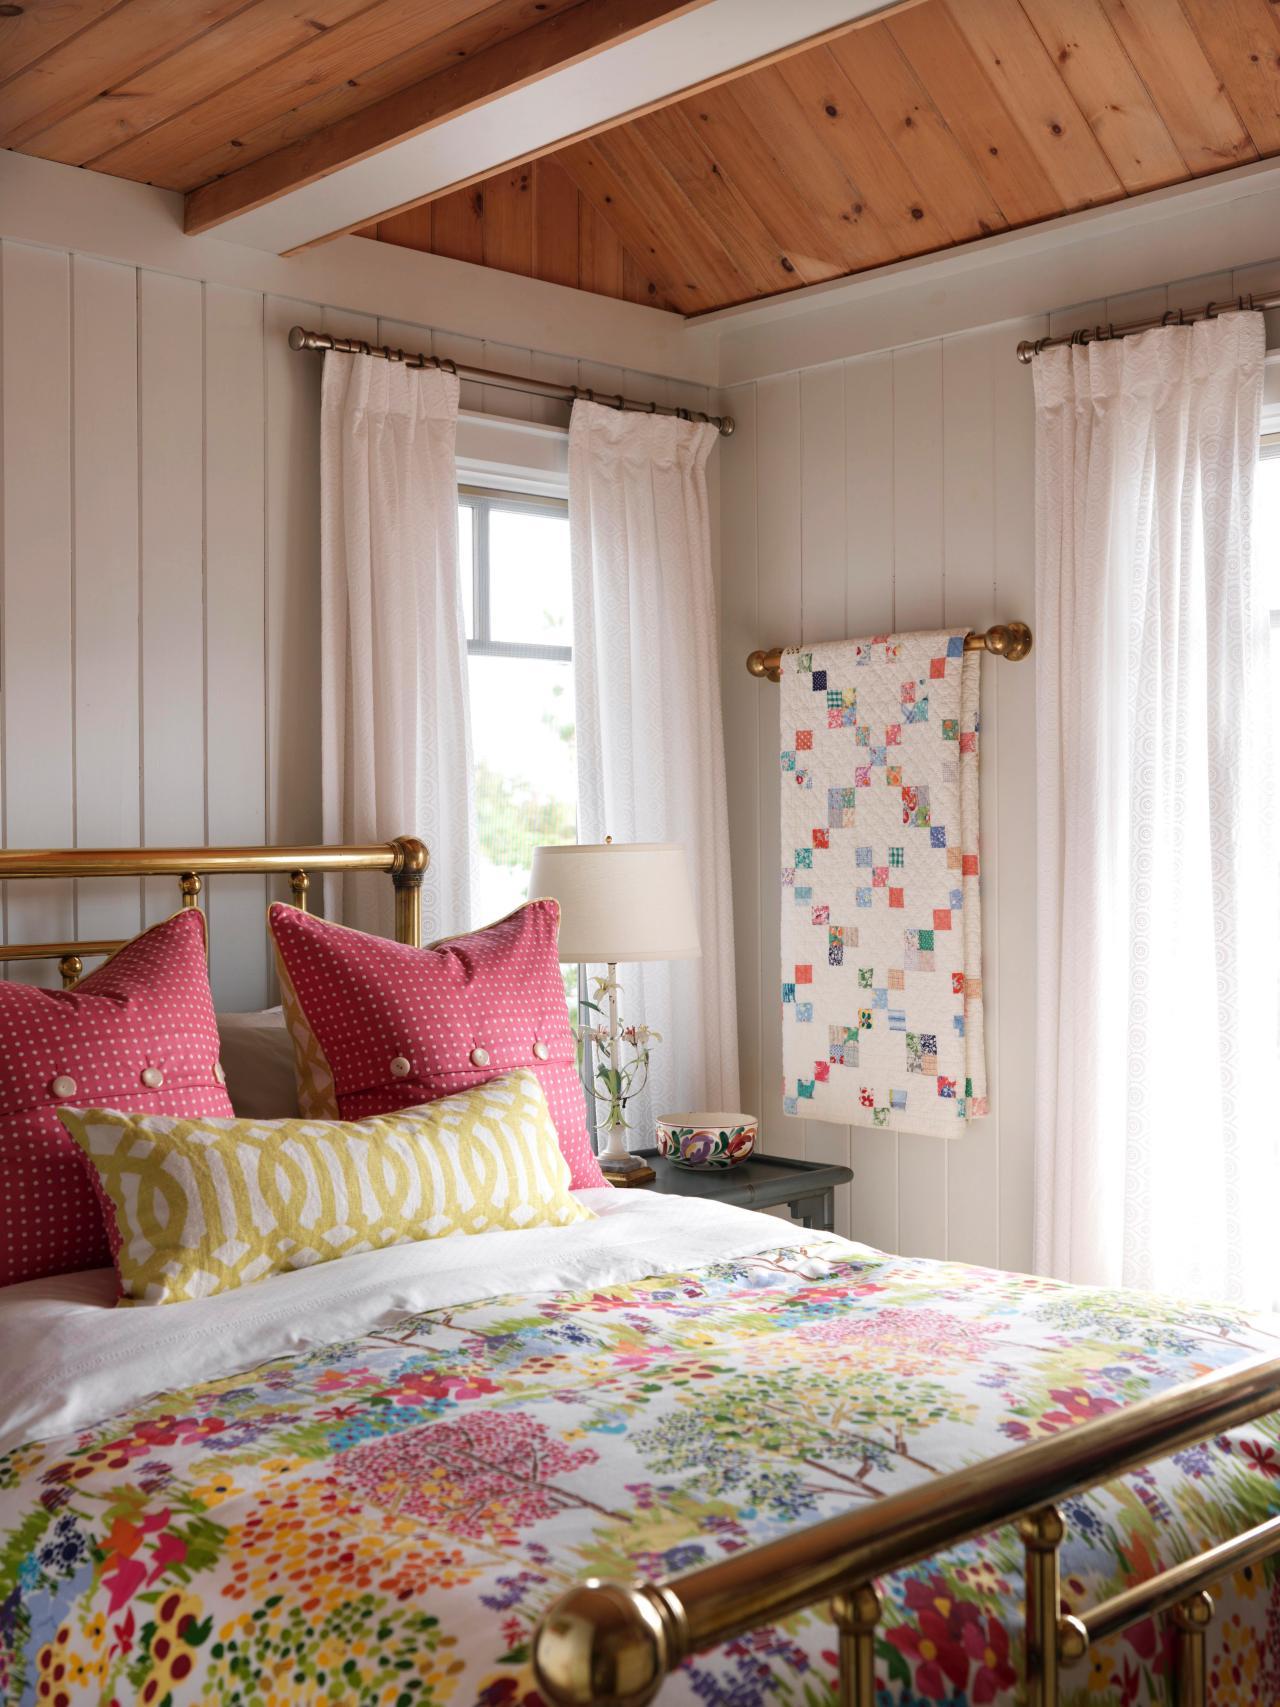 hssuh102 cottage bedroom brass bed and quilt